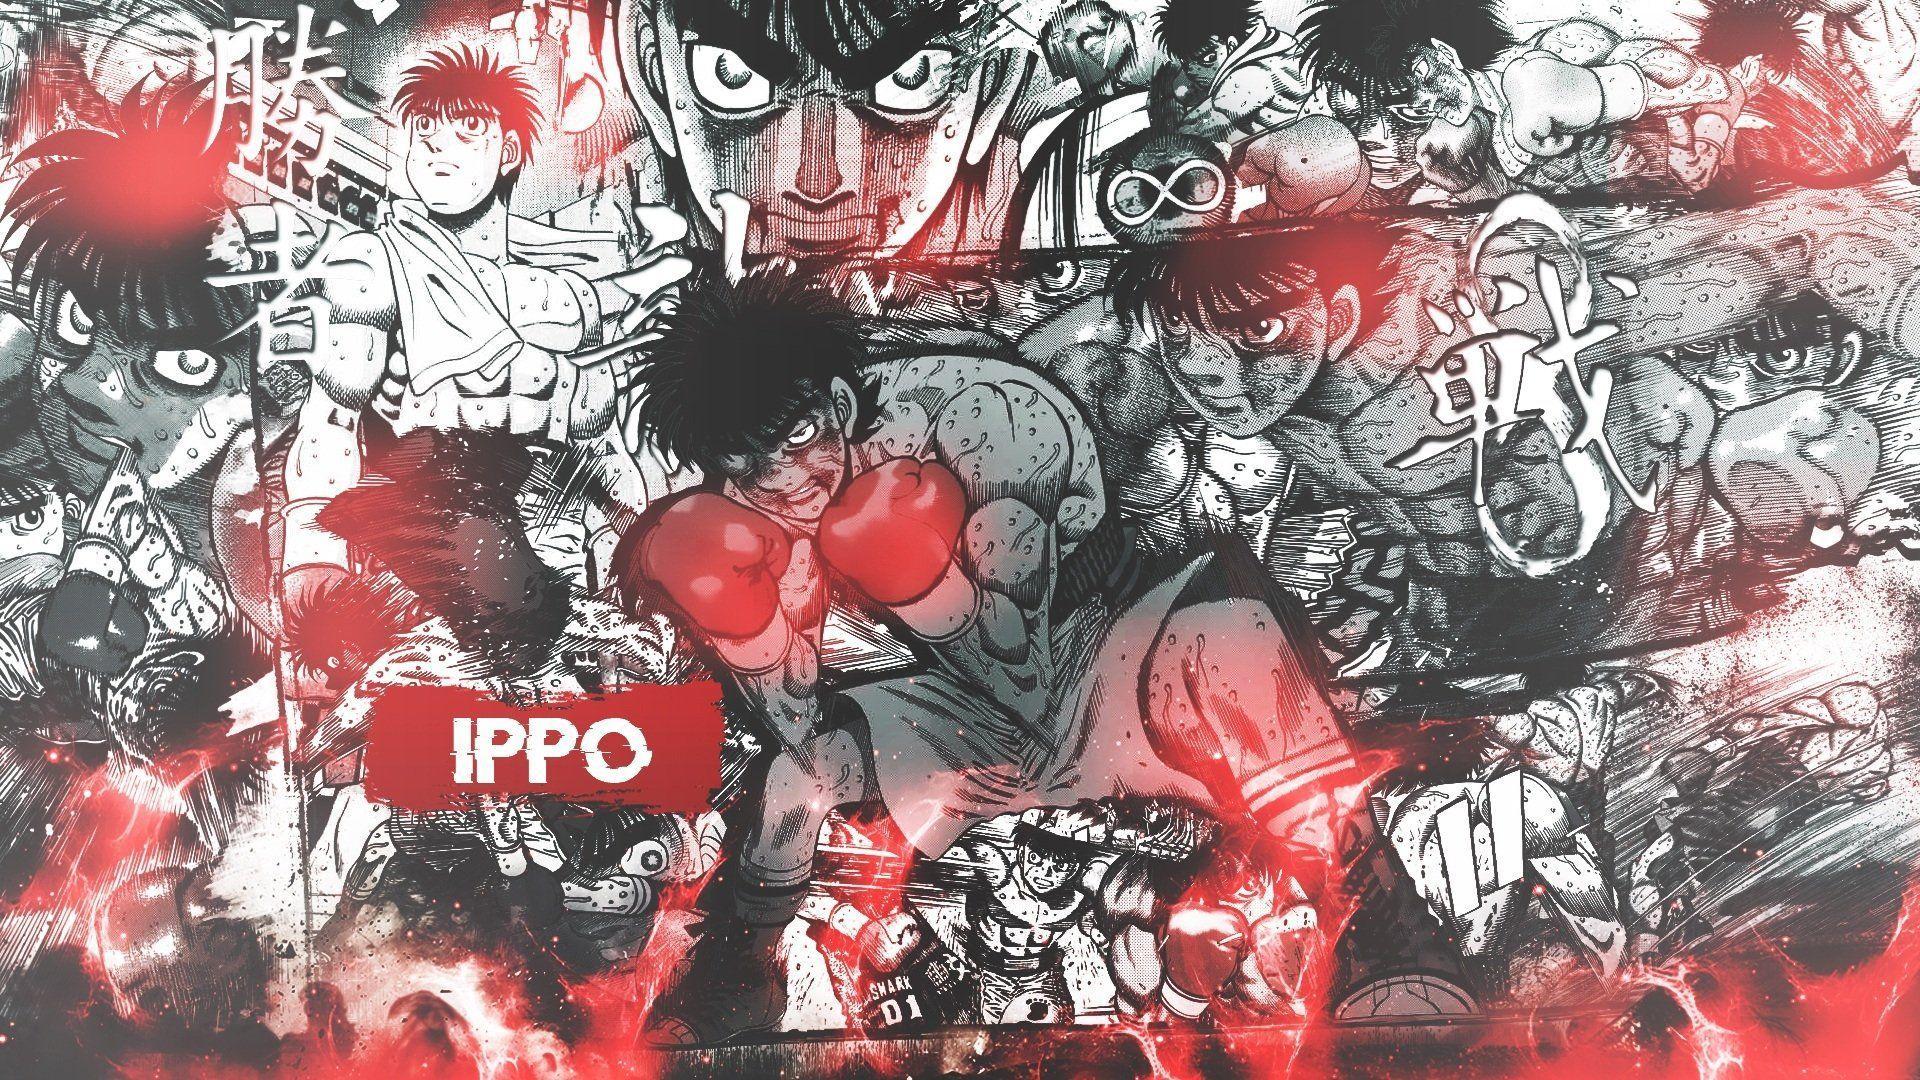 Hajime No Ippo Wallpapers Top Free Hajime No Ippo Backgrounds